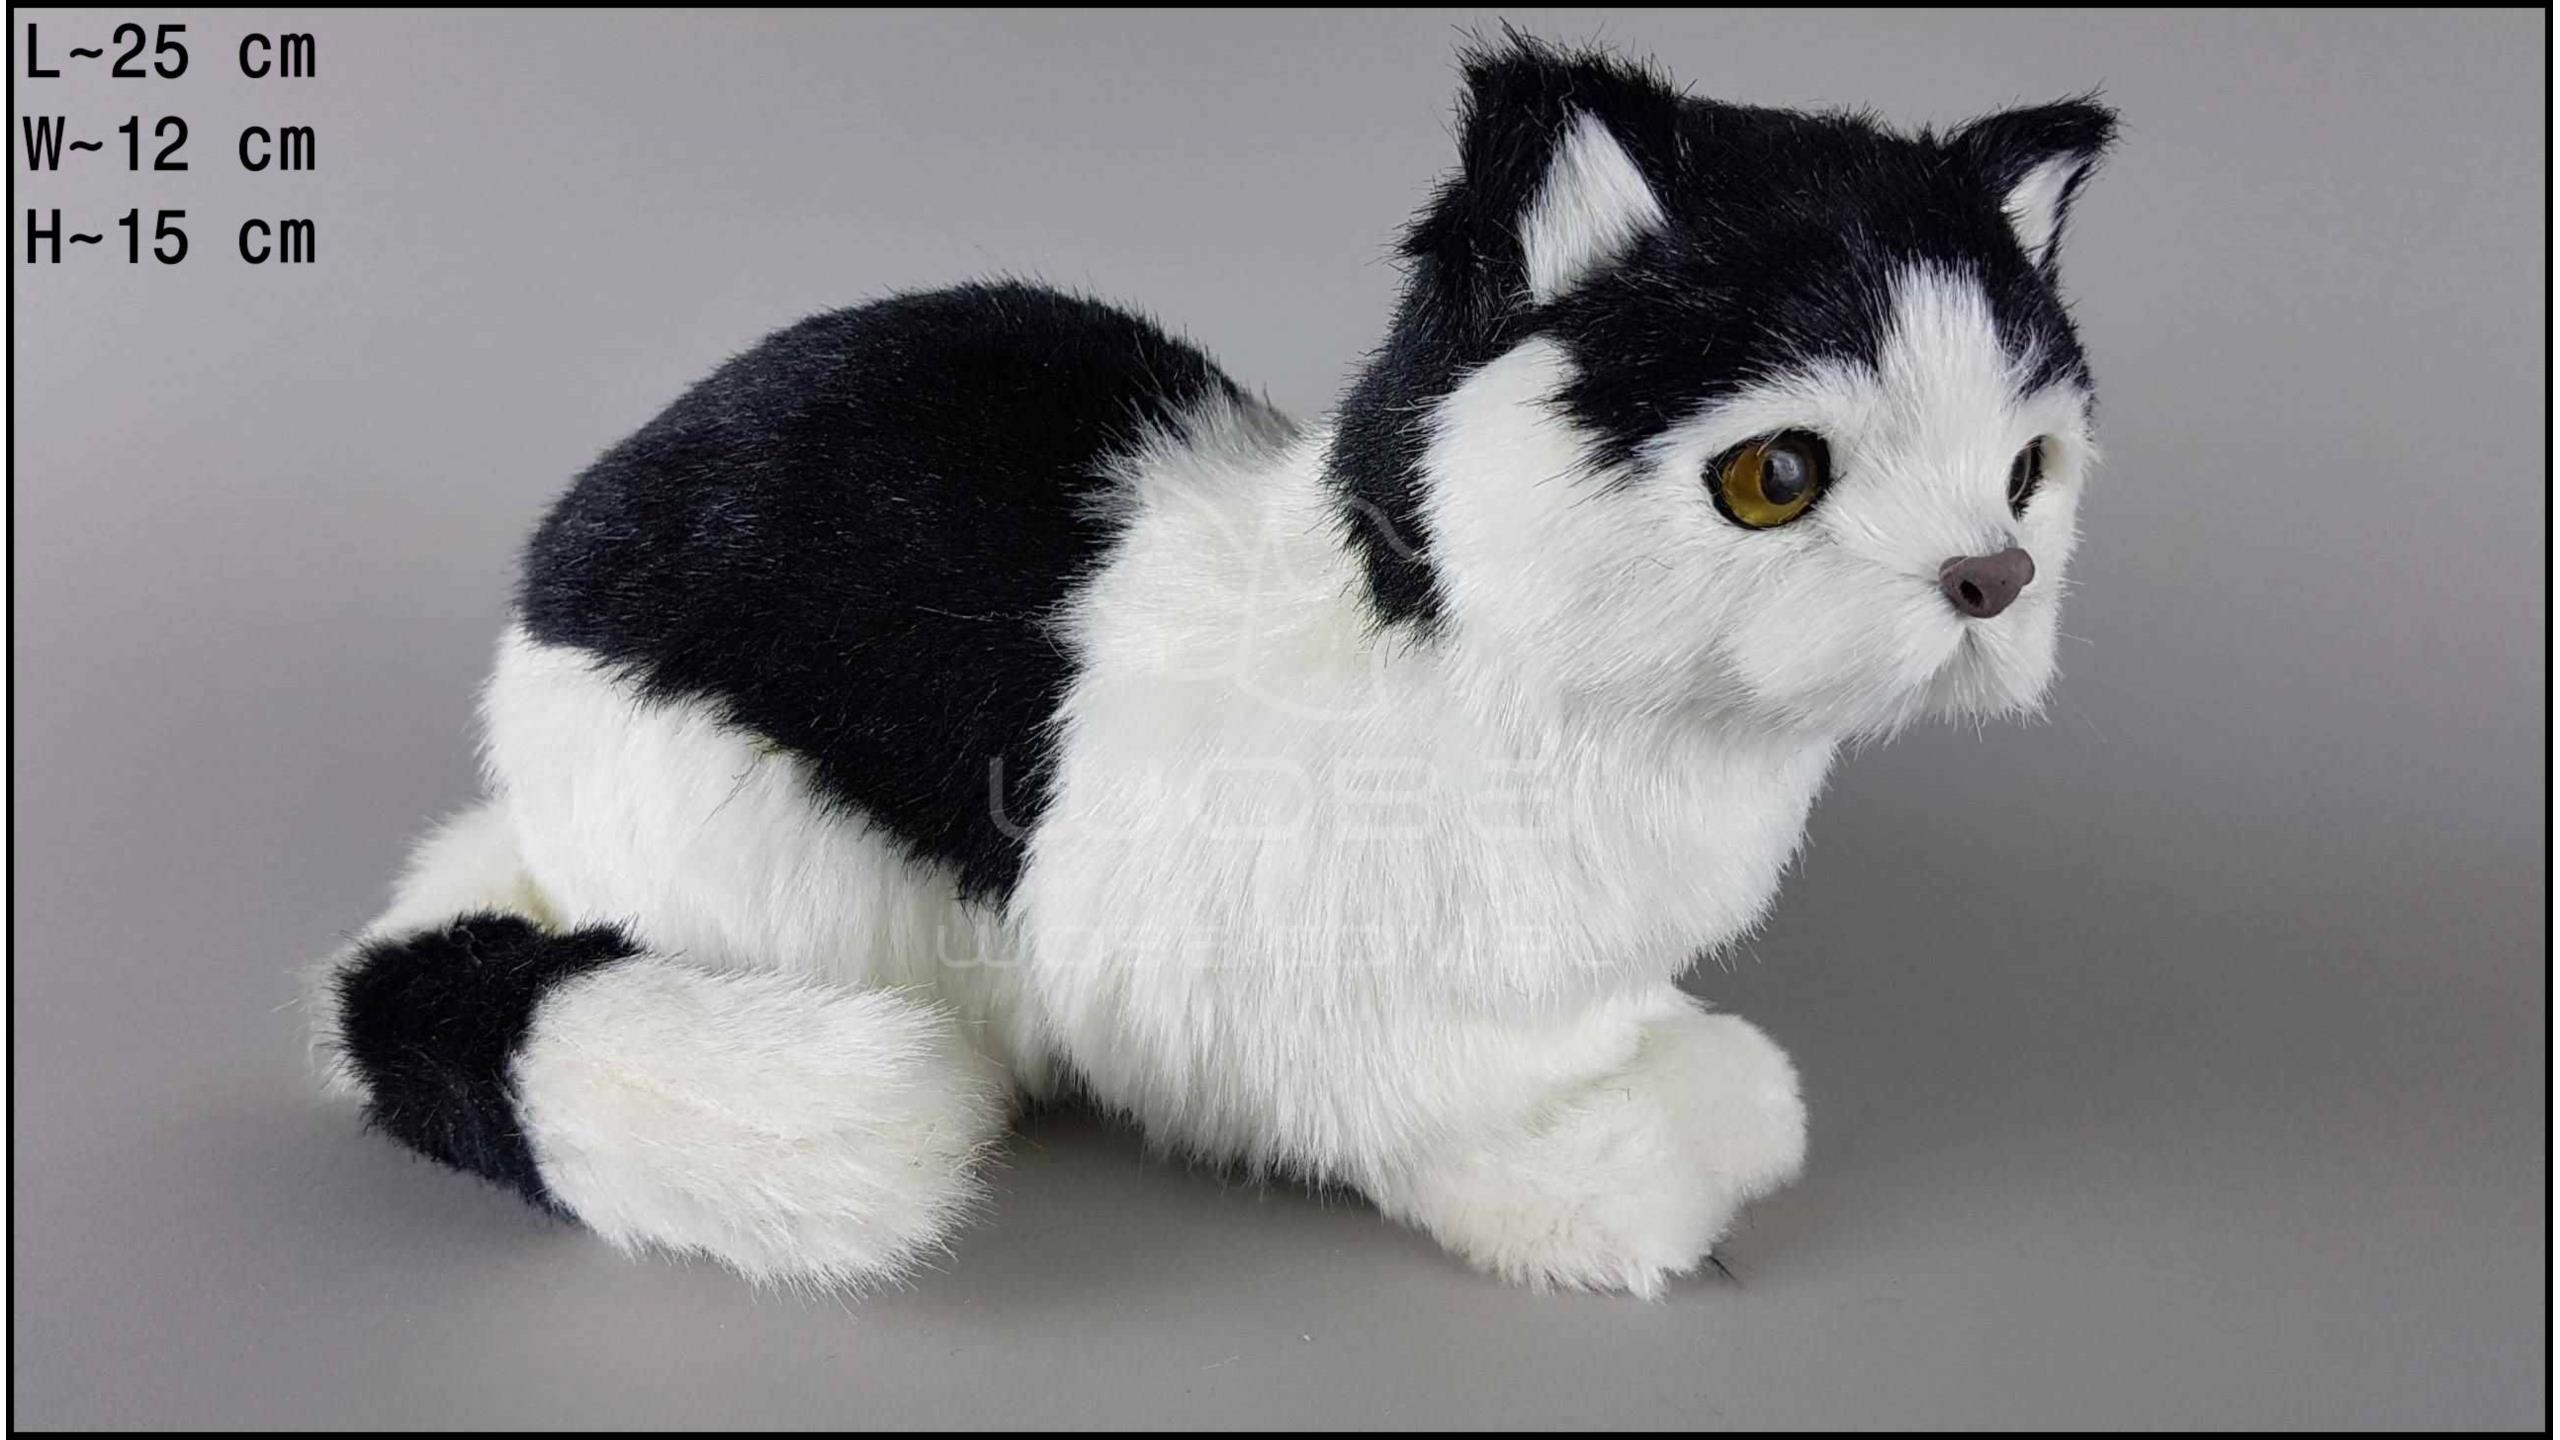 Large cat sitting - Black & White